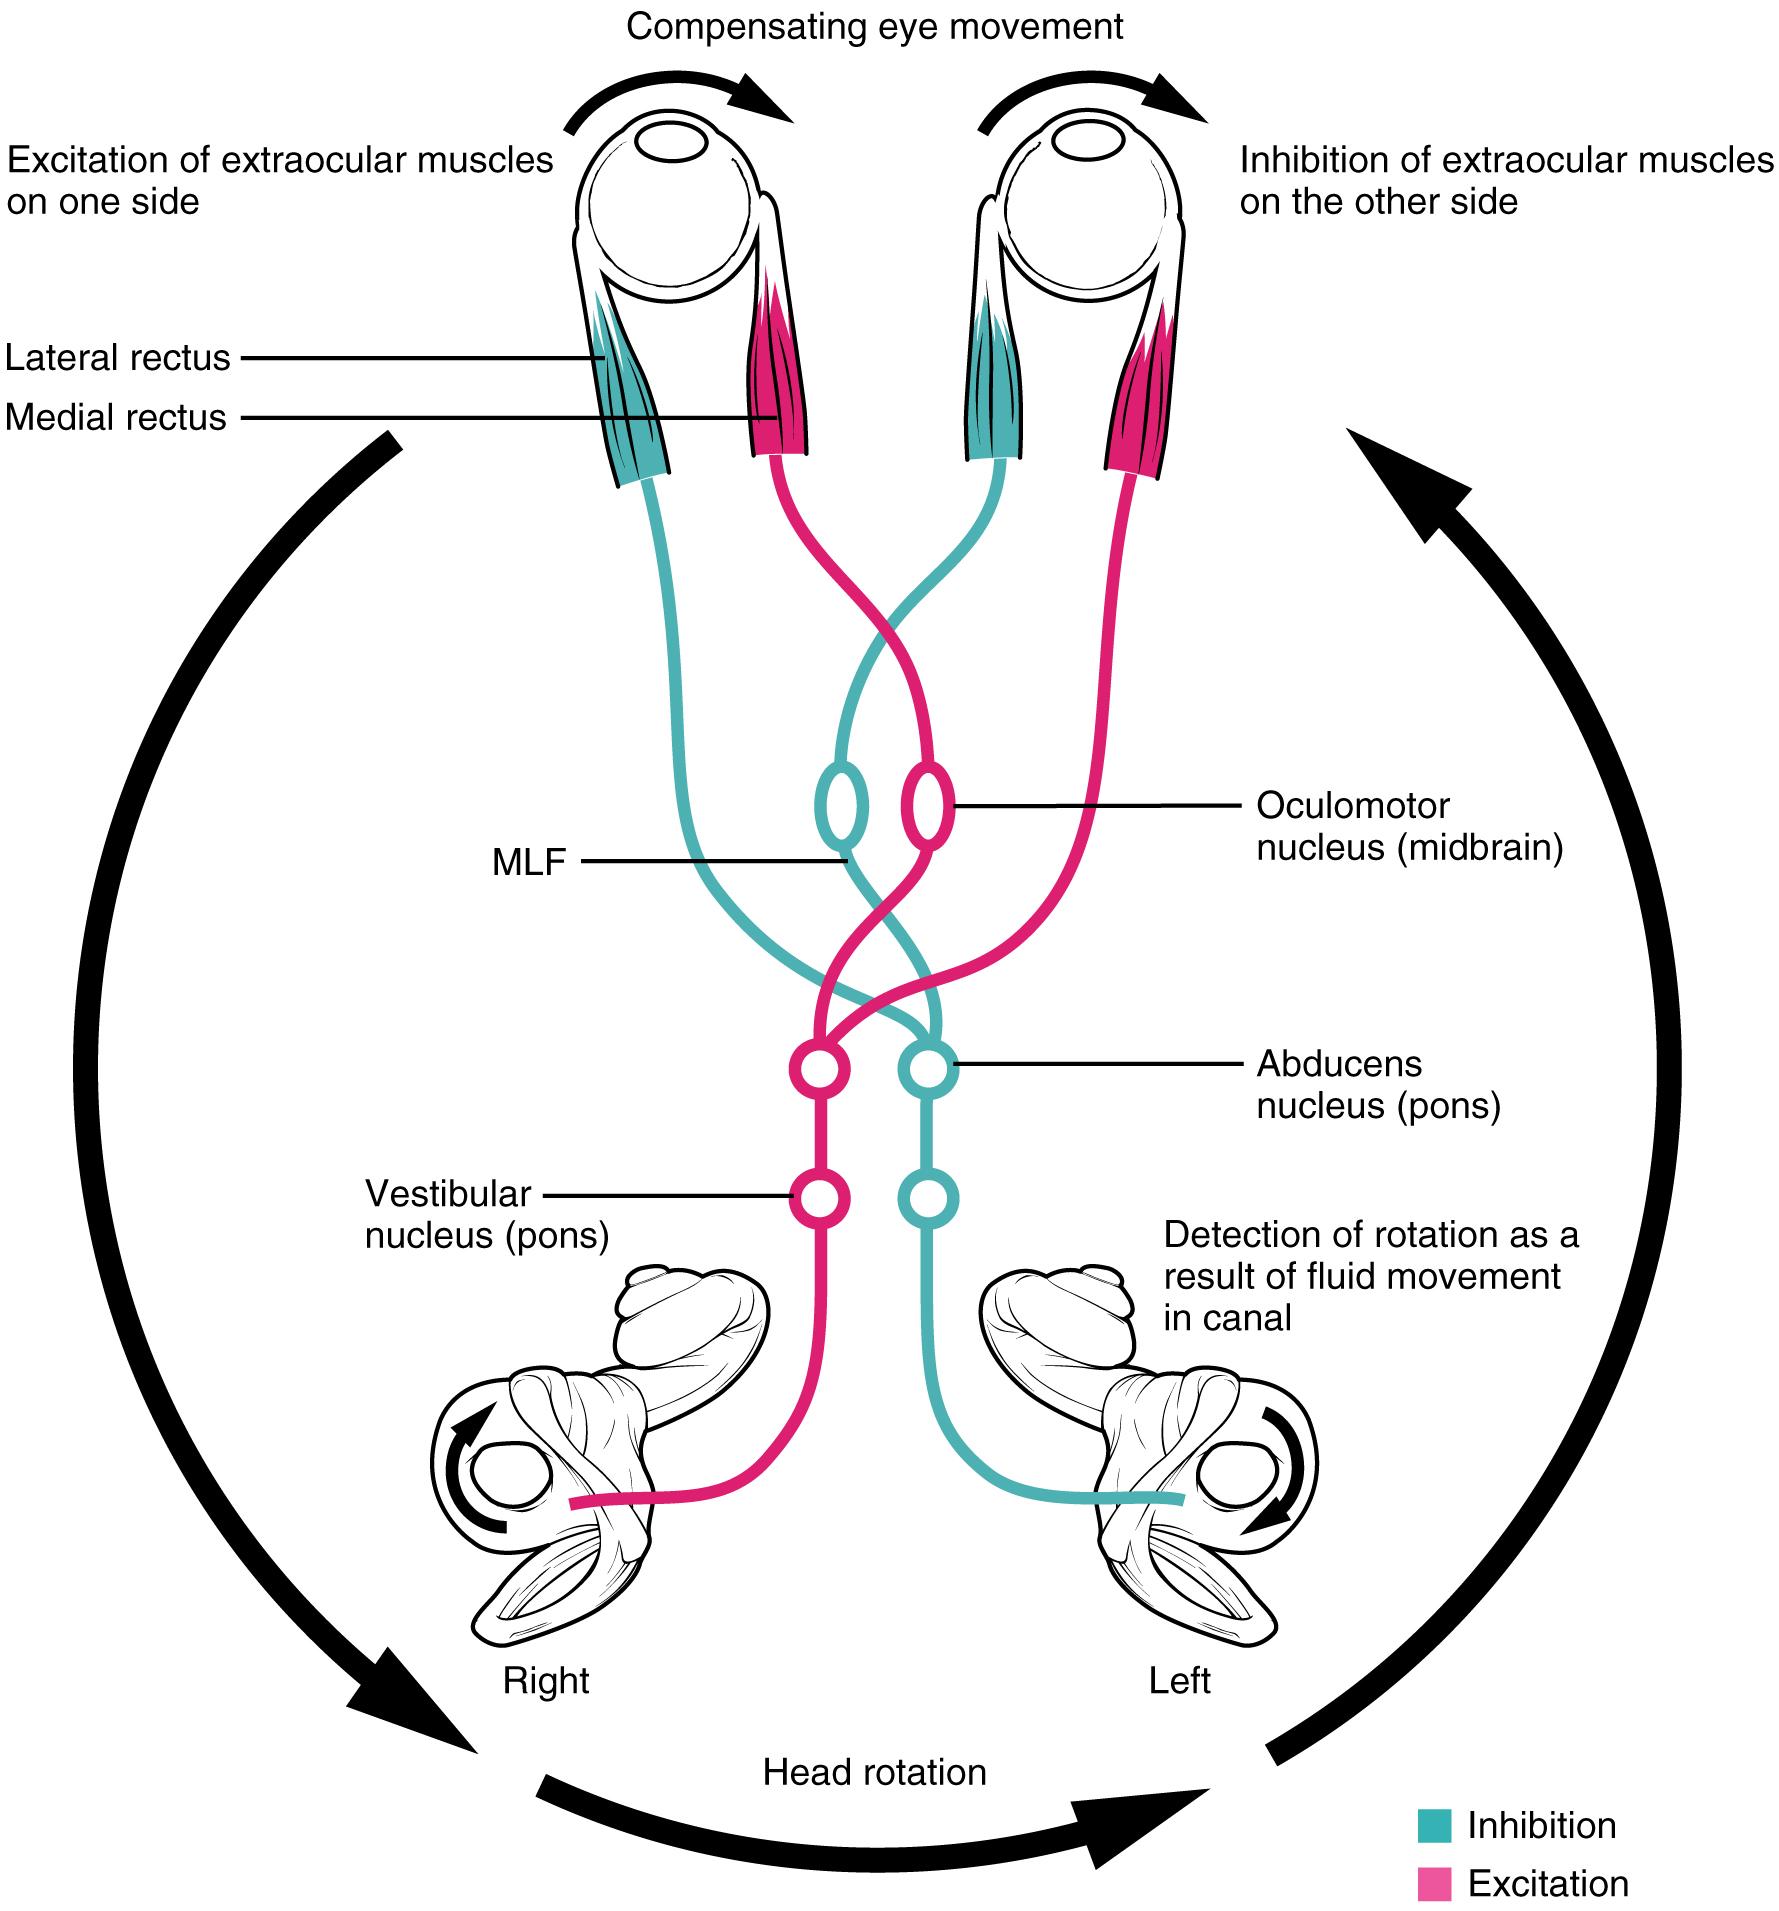 Vestibulookuläre Reflex (VOR) und Hirnnerv VIII: Nervus vestibulocochlearis